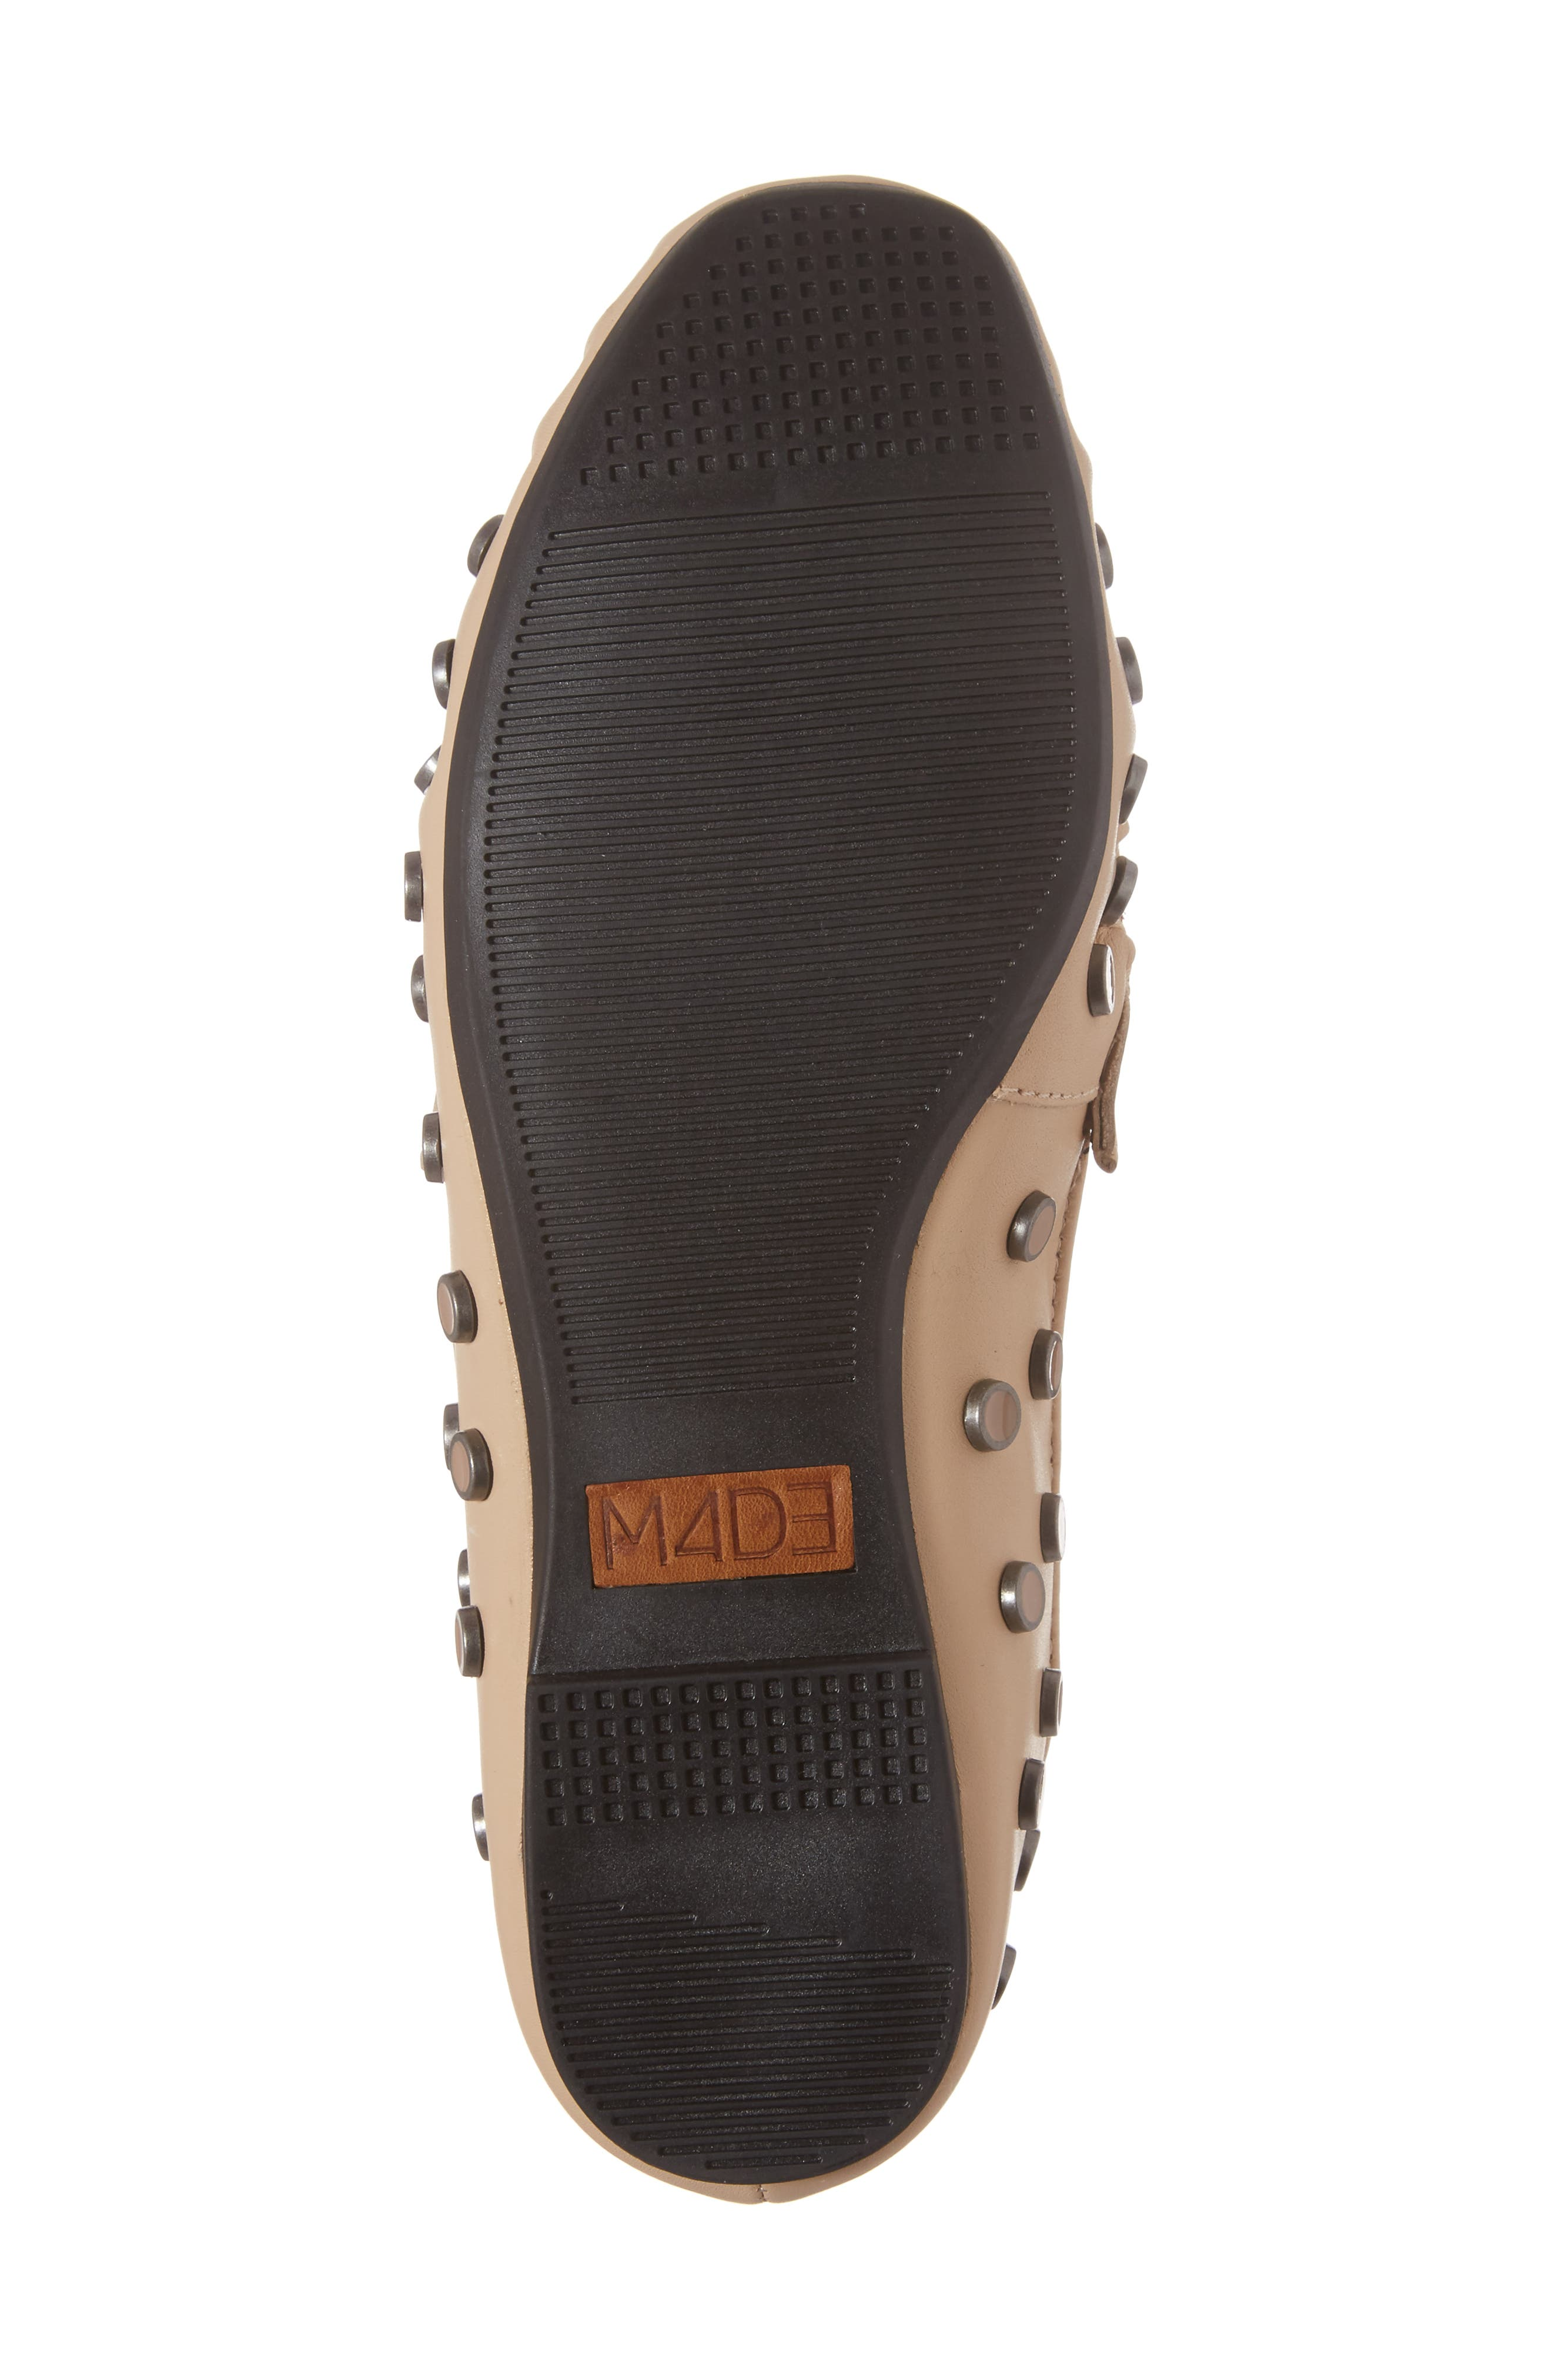 M4D3 Conneticut Loafer,                             Alternate thumbnail 6, color,                             Bisque Leather